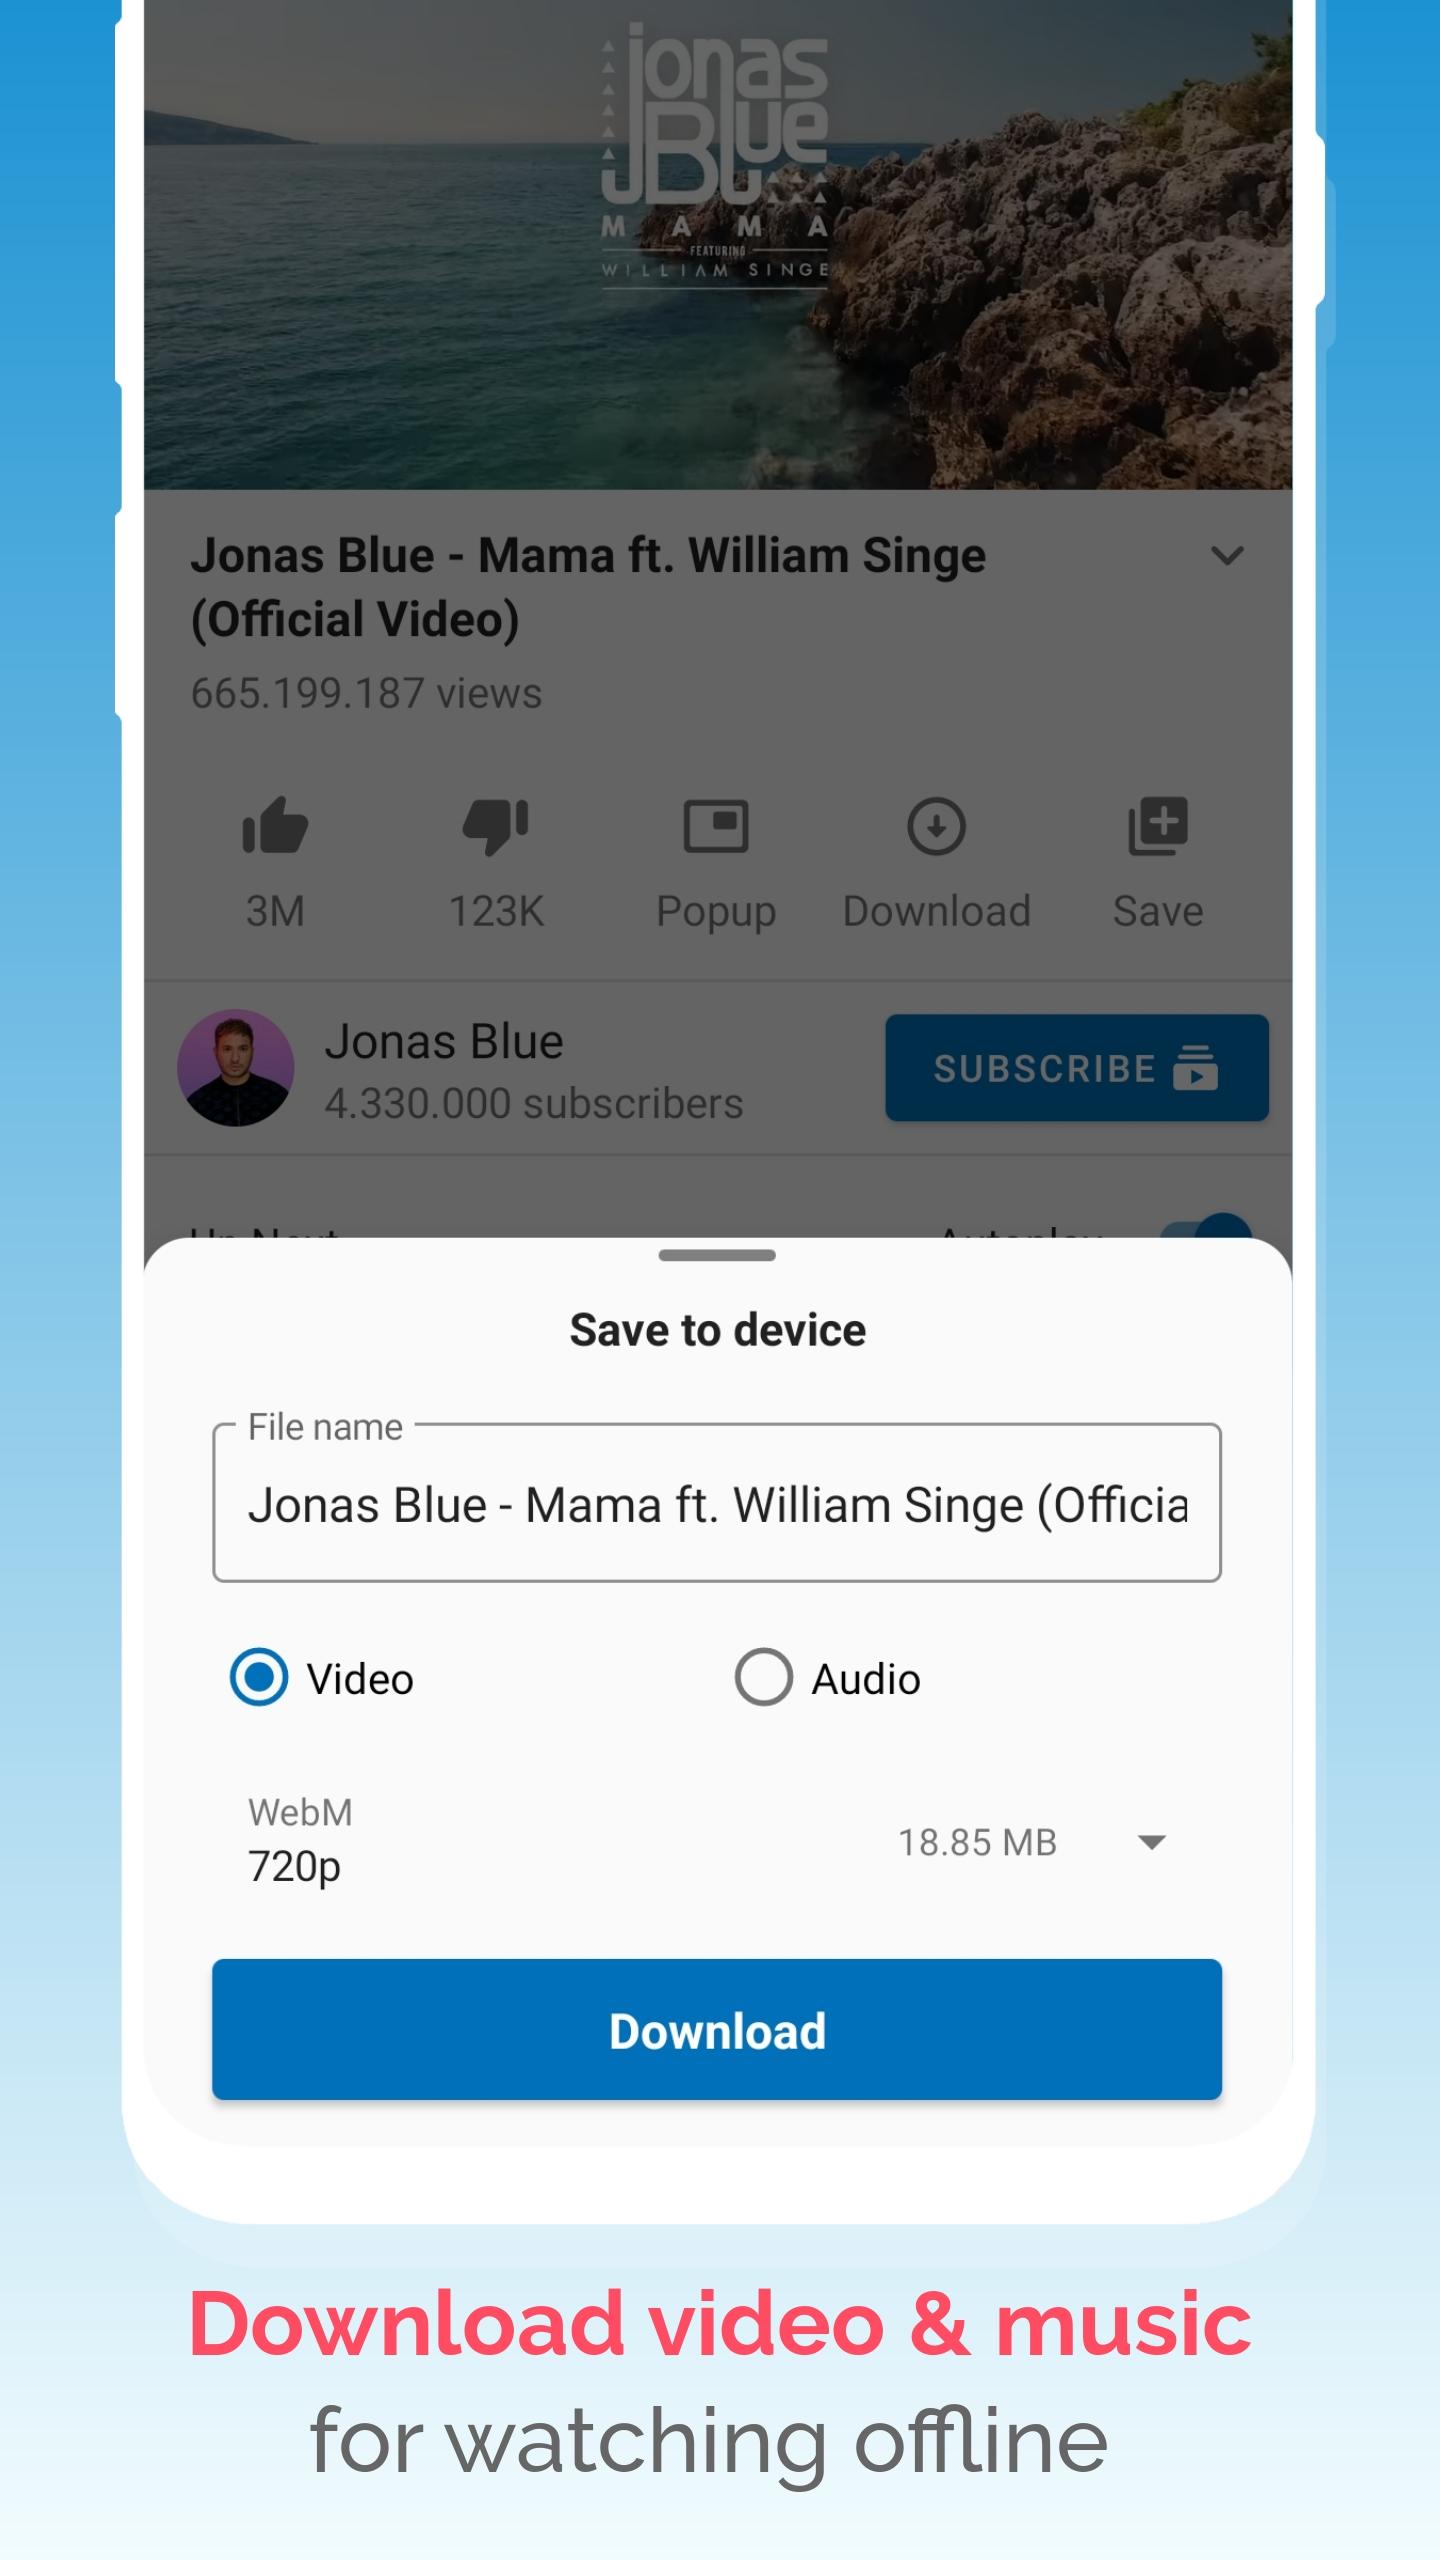 download-video-music.jpg?alt=media